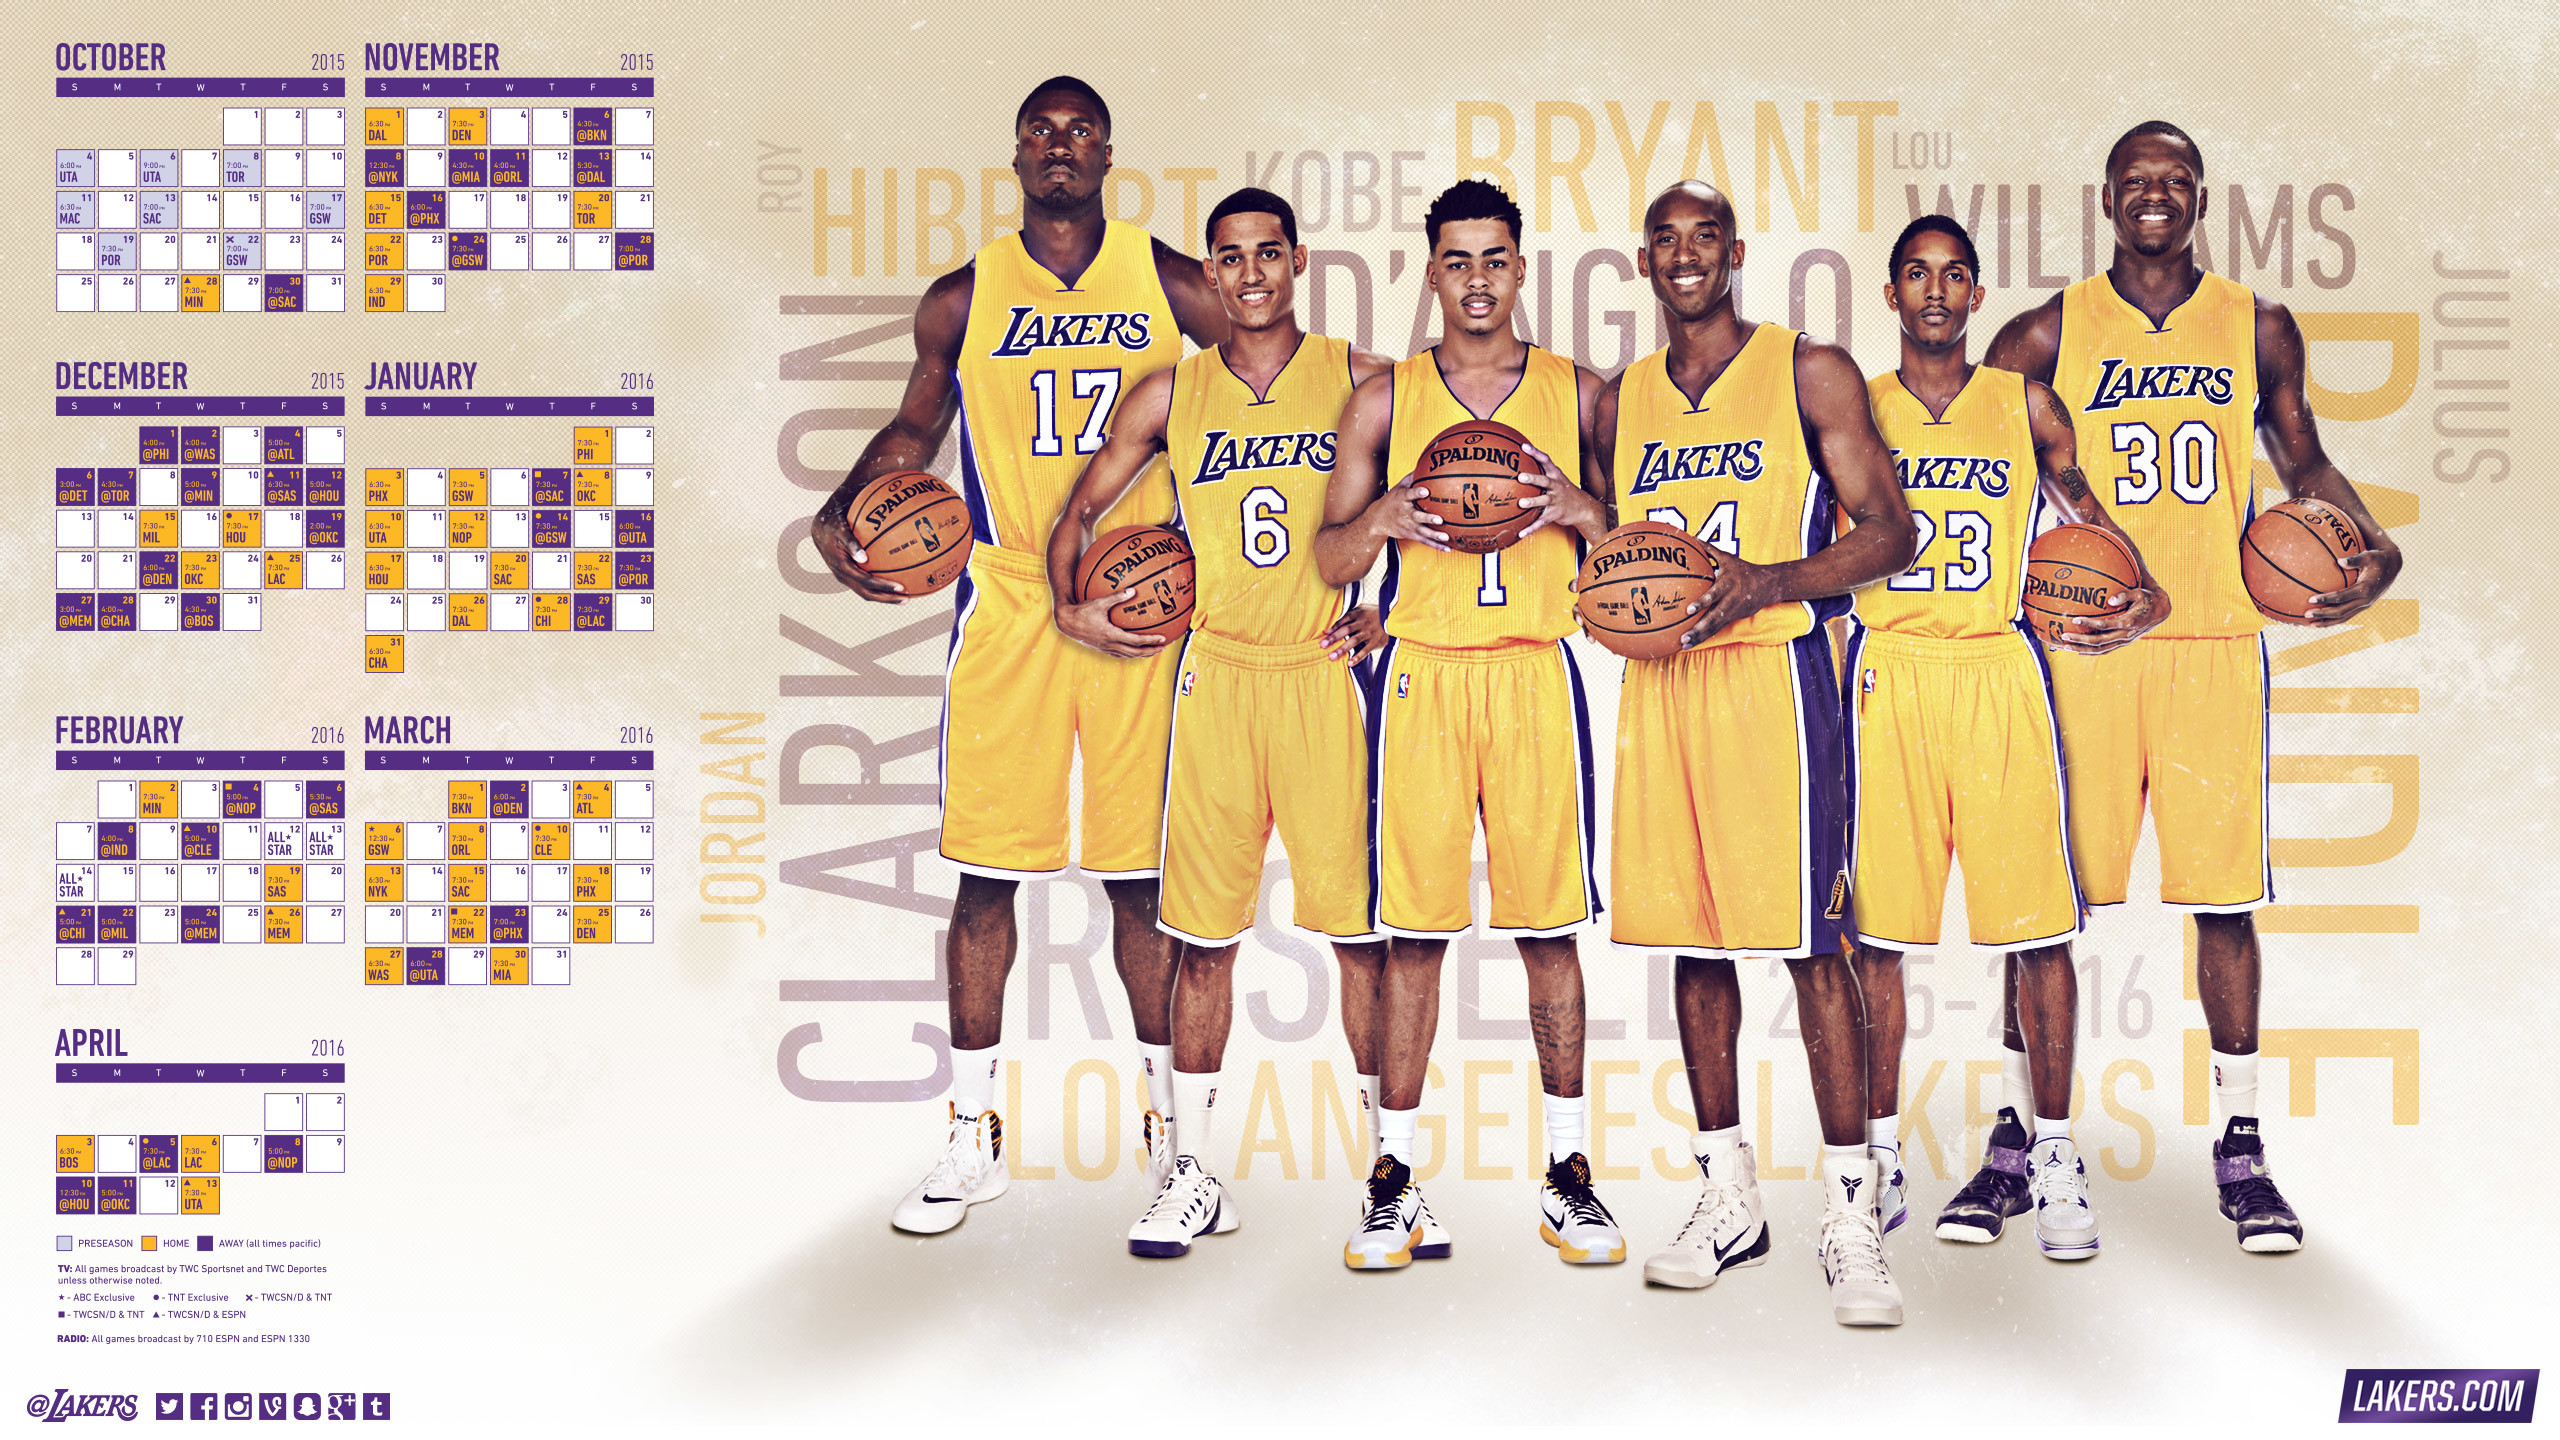 1920x1080 la lakers 2017 nba basketball team logo december schedule hardwood wallpaper free on mac and desktop